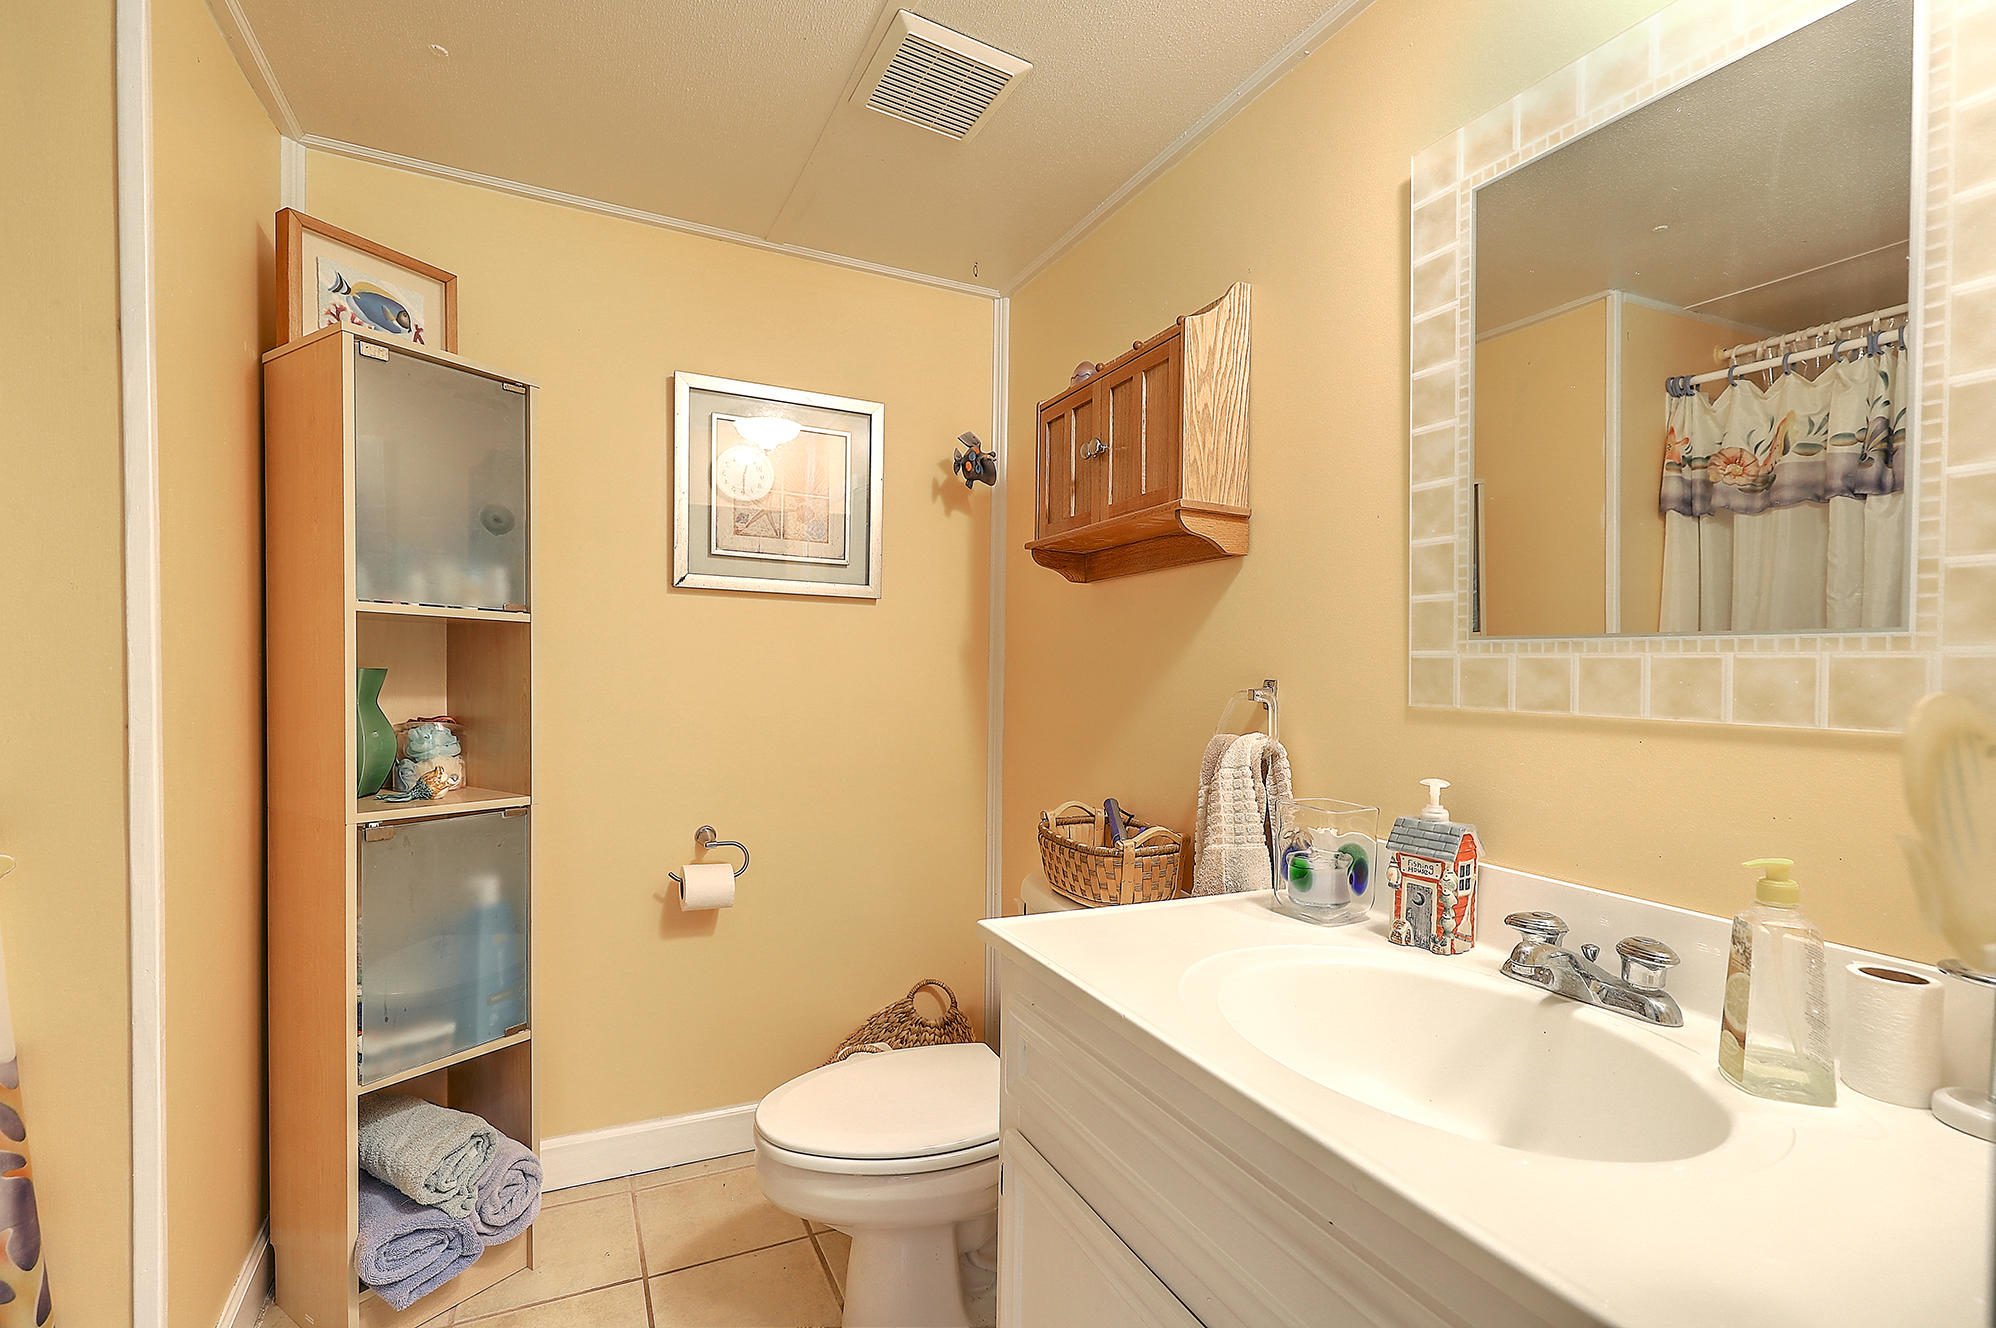 Cross Area (West) Homes For Sale - 128 Cherry Grove, Cross, SC - 35